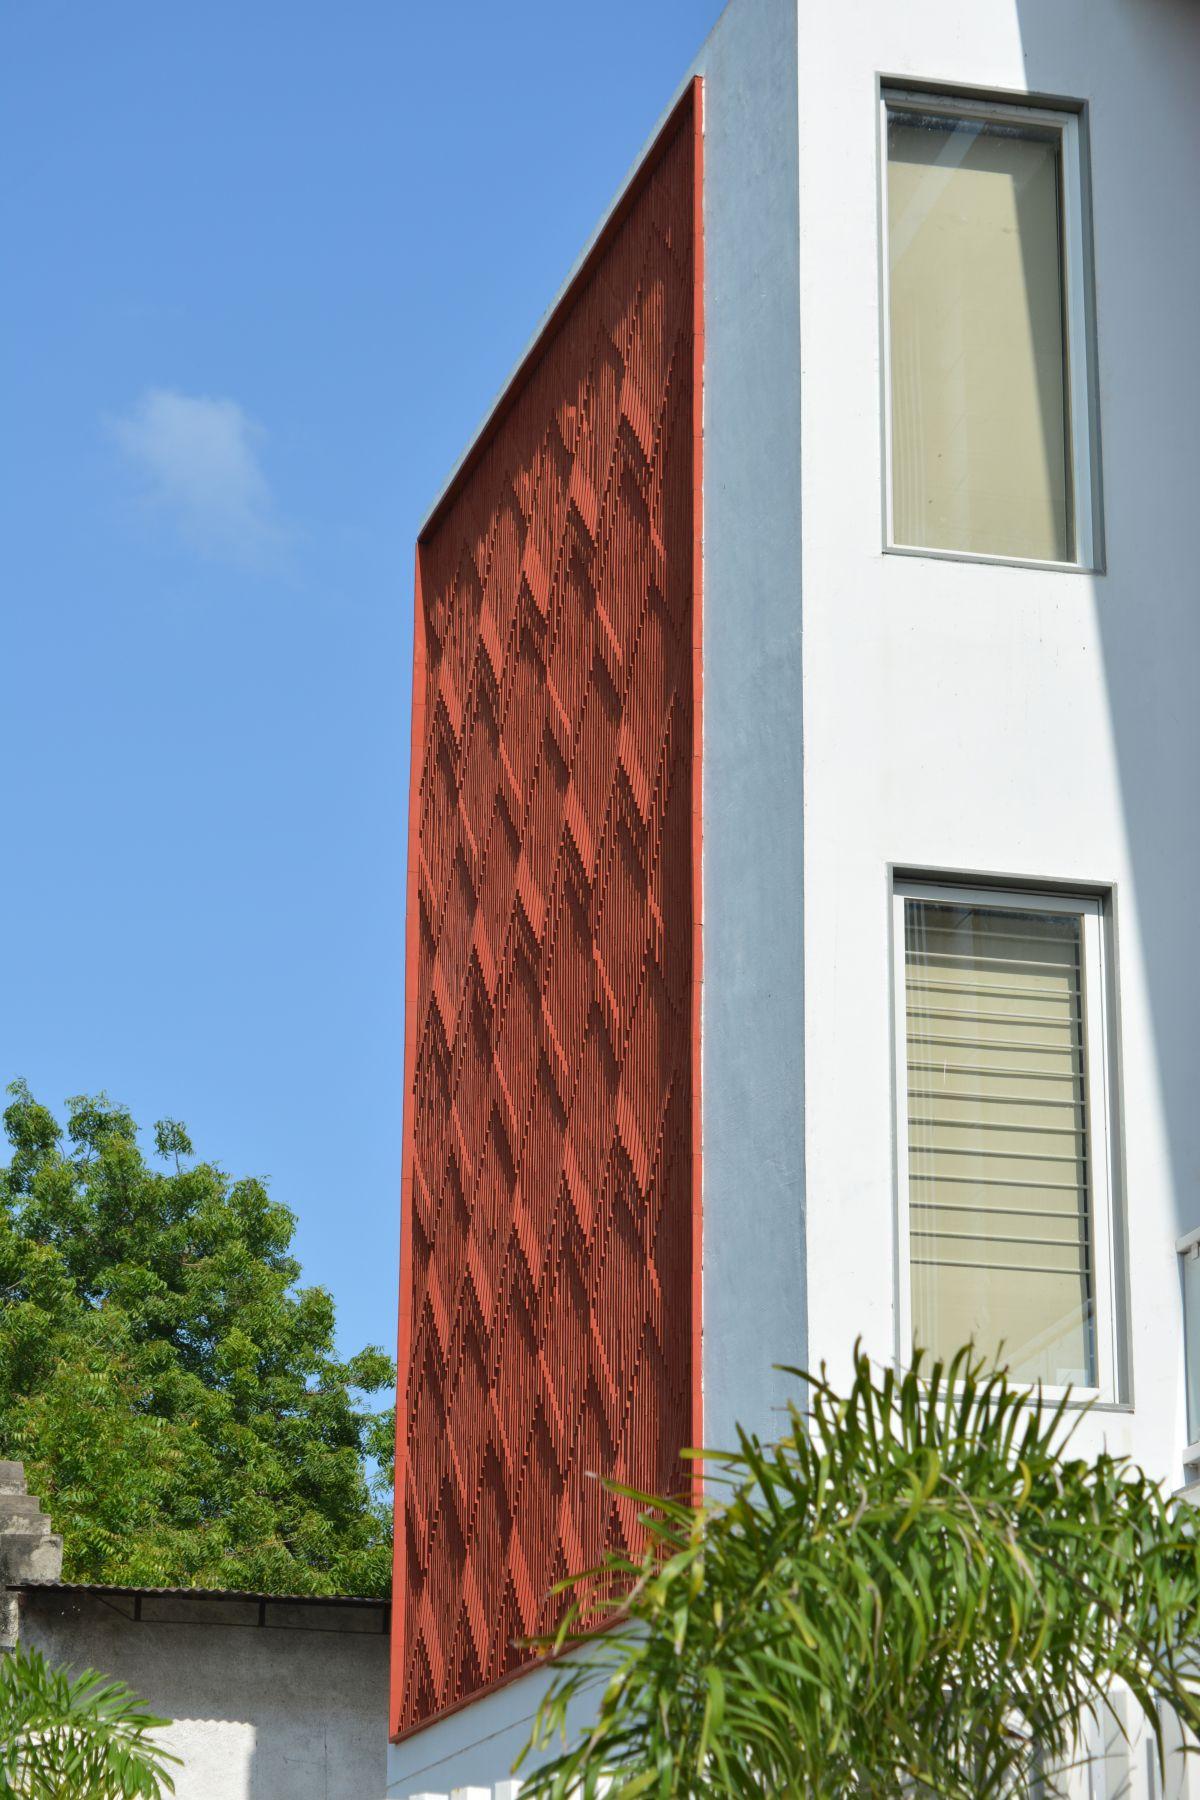 Clay roof tiles façade to minimize heat gain and has decorative function, at Vadodara, by Manoj Patel Design Studio 61